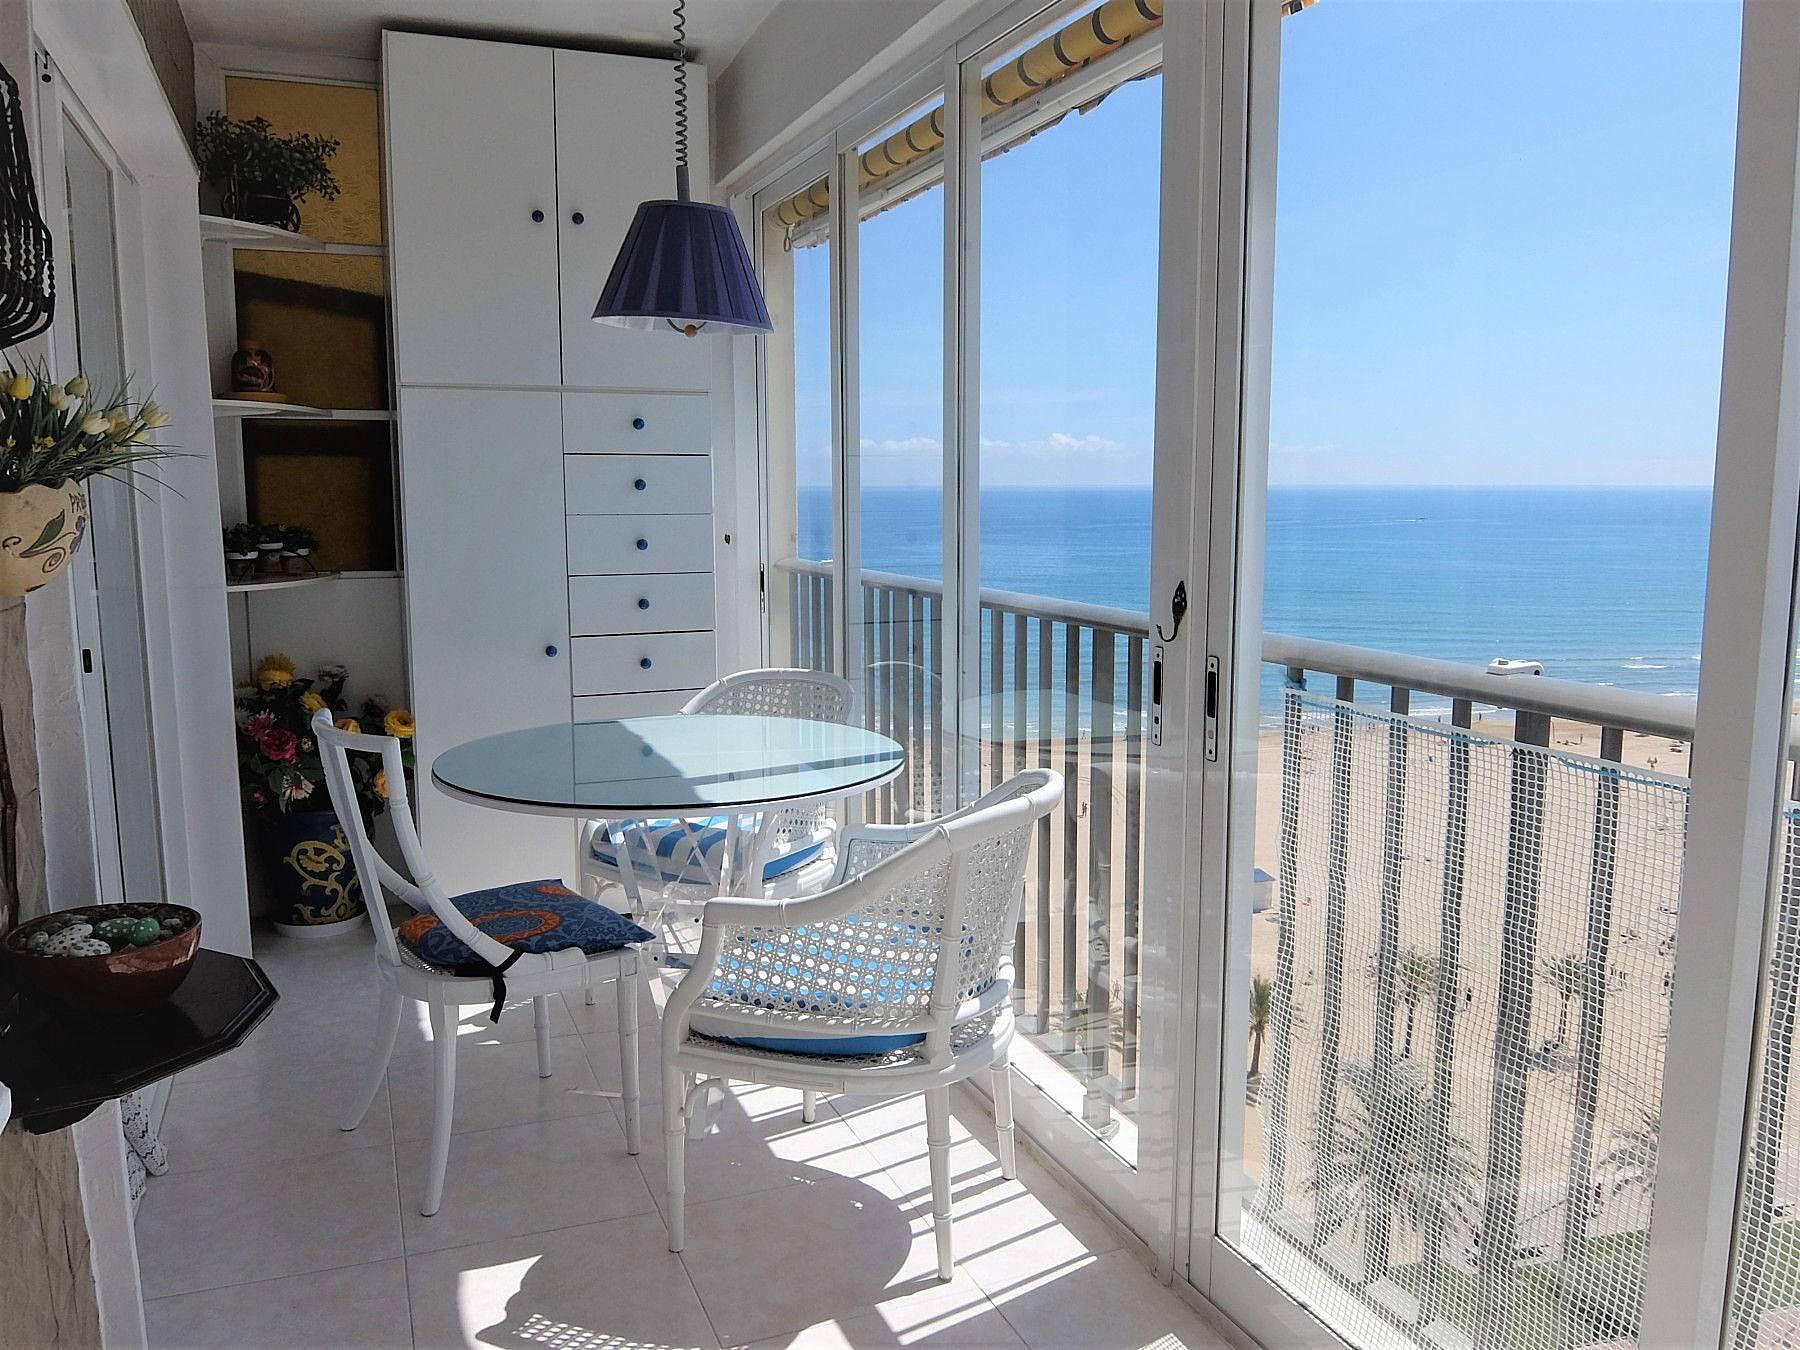 Apartamento para 4 personas en gandia grau i platja gandia valencia - Apartamentos en gandia ...